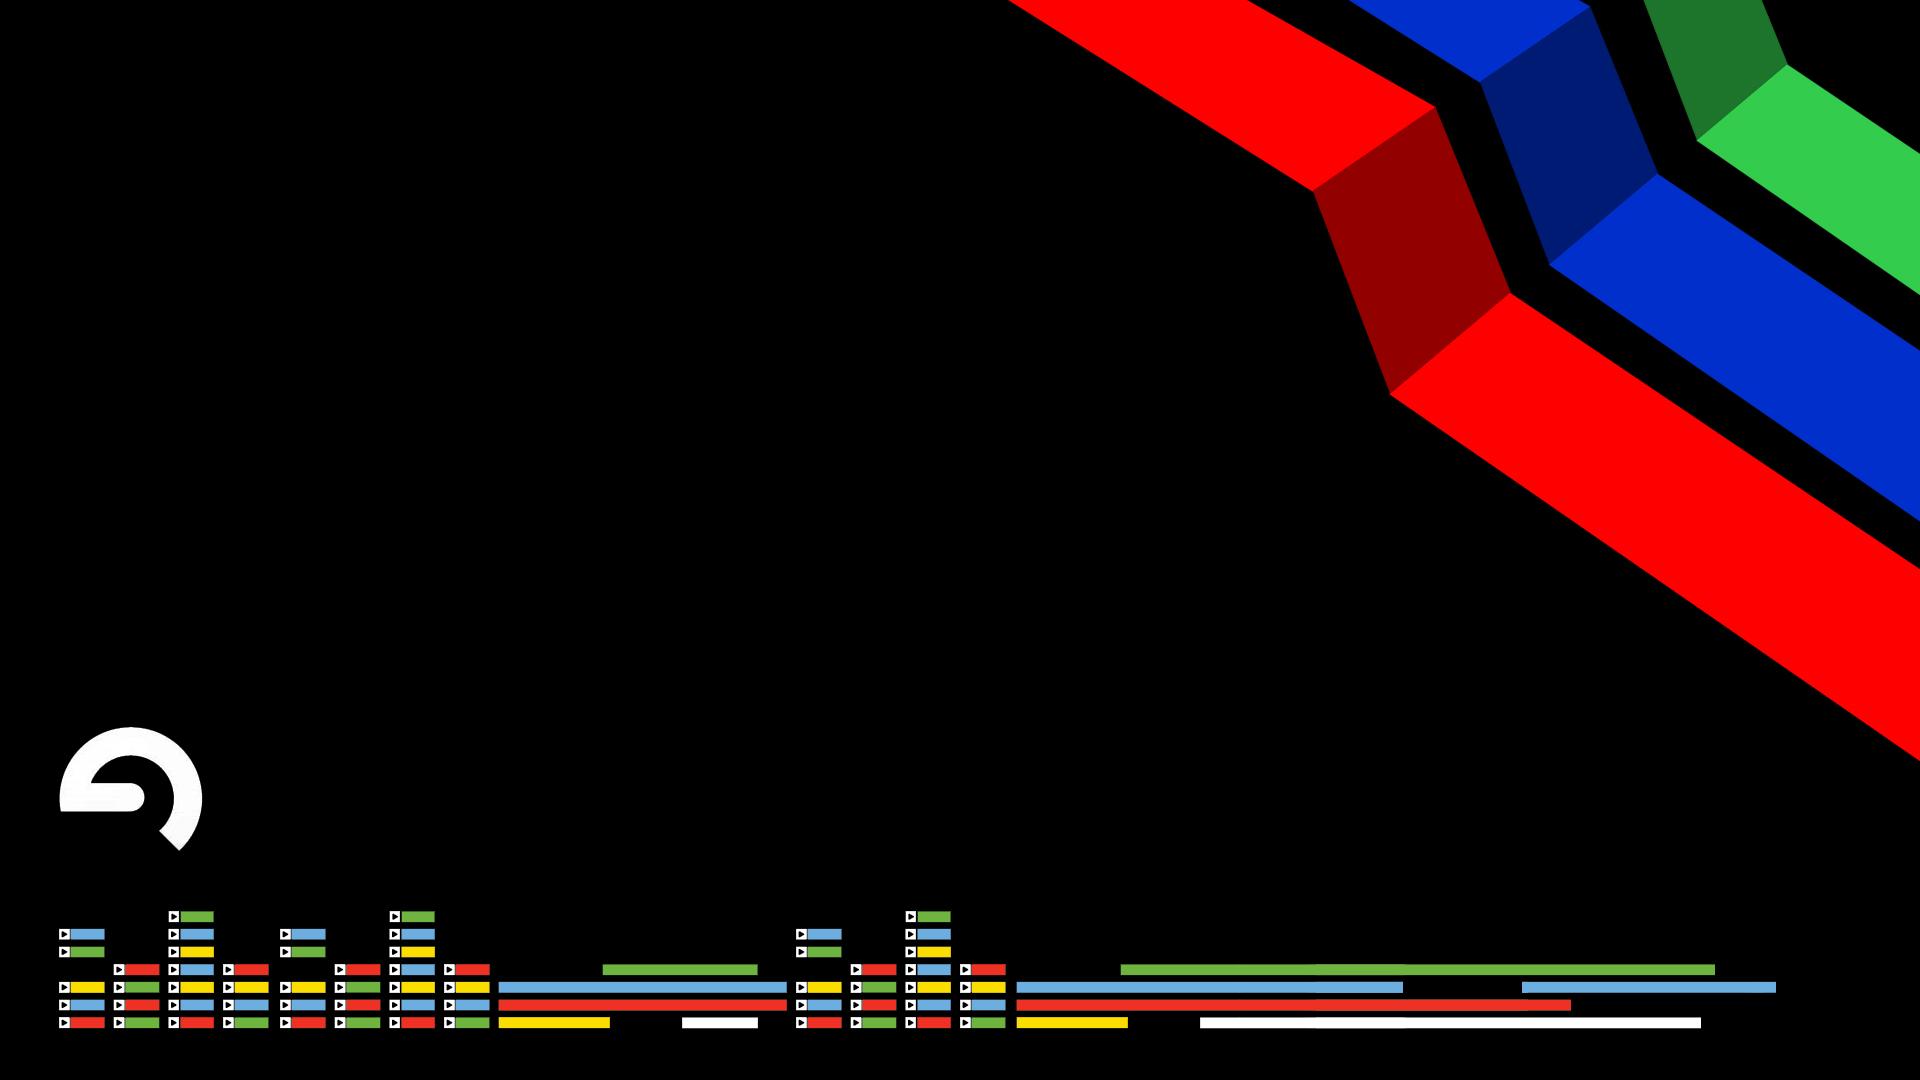 Ableton Live Background 1080p by ryanpridgeon 1920x1080